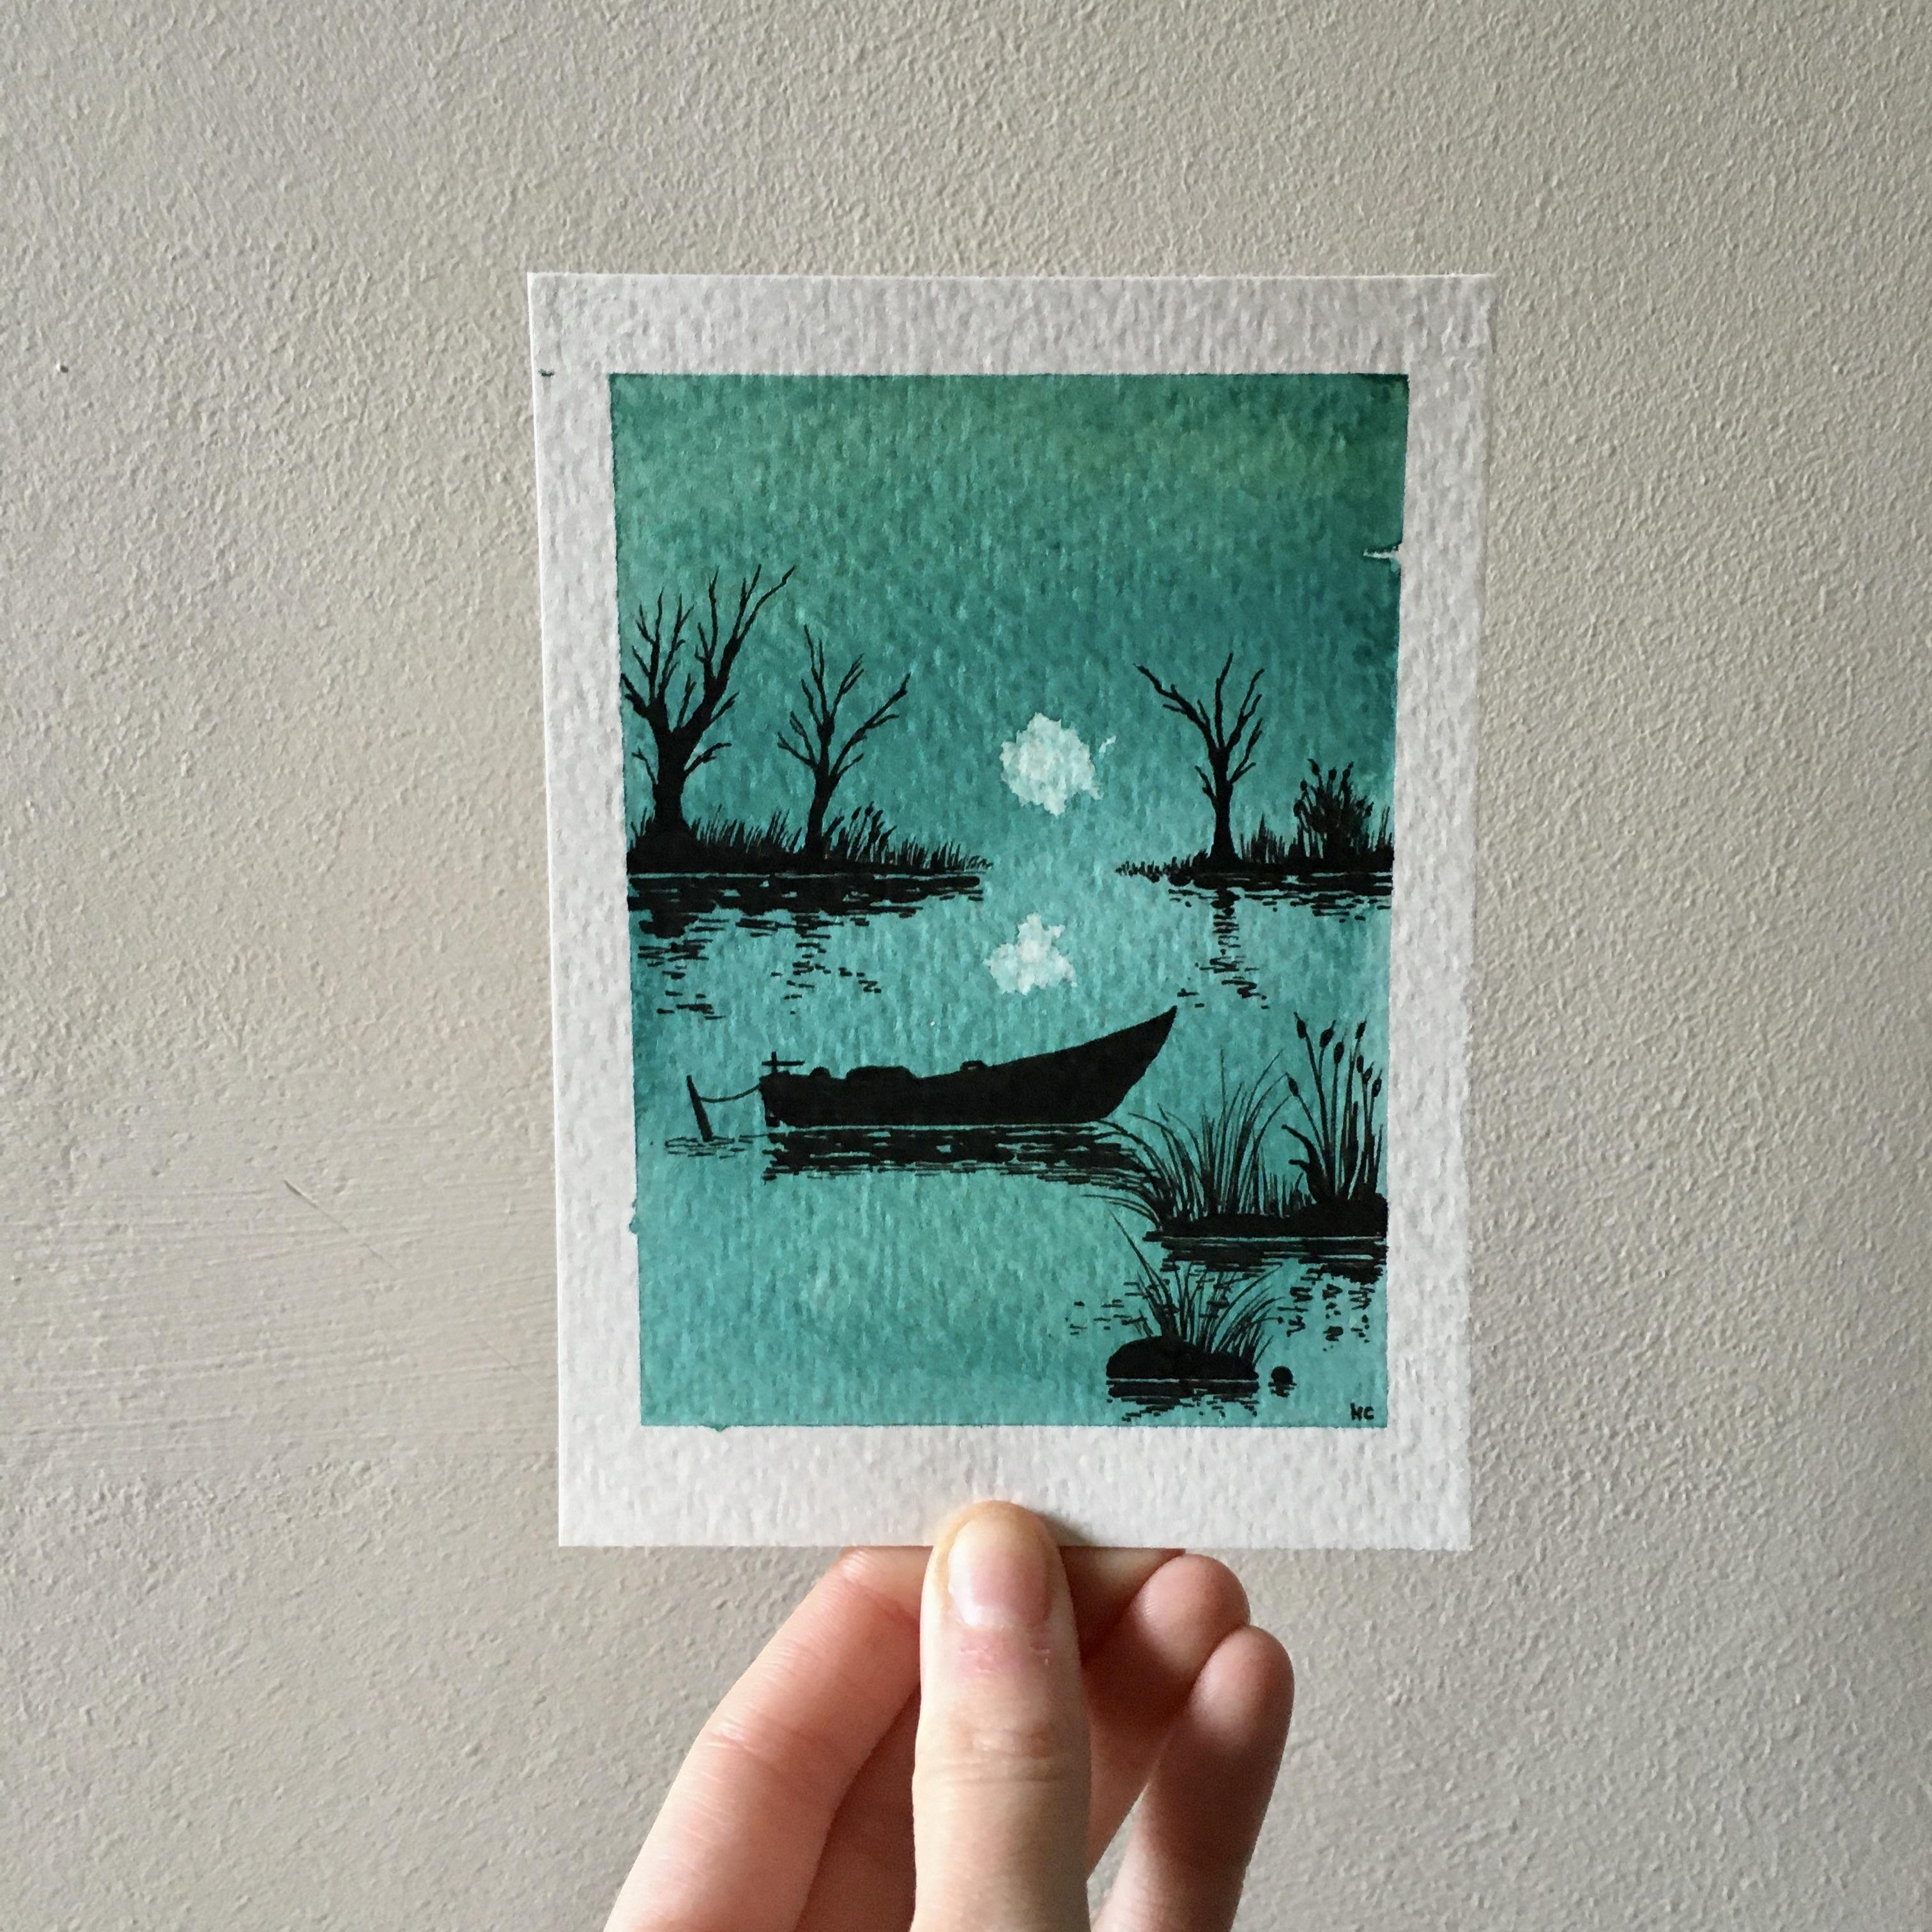 Peaceful moon over the lake